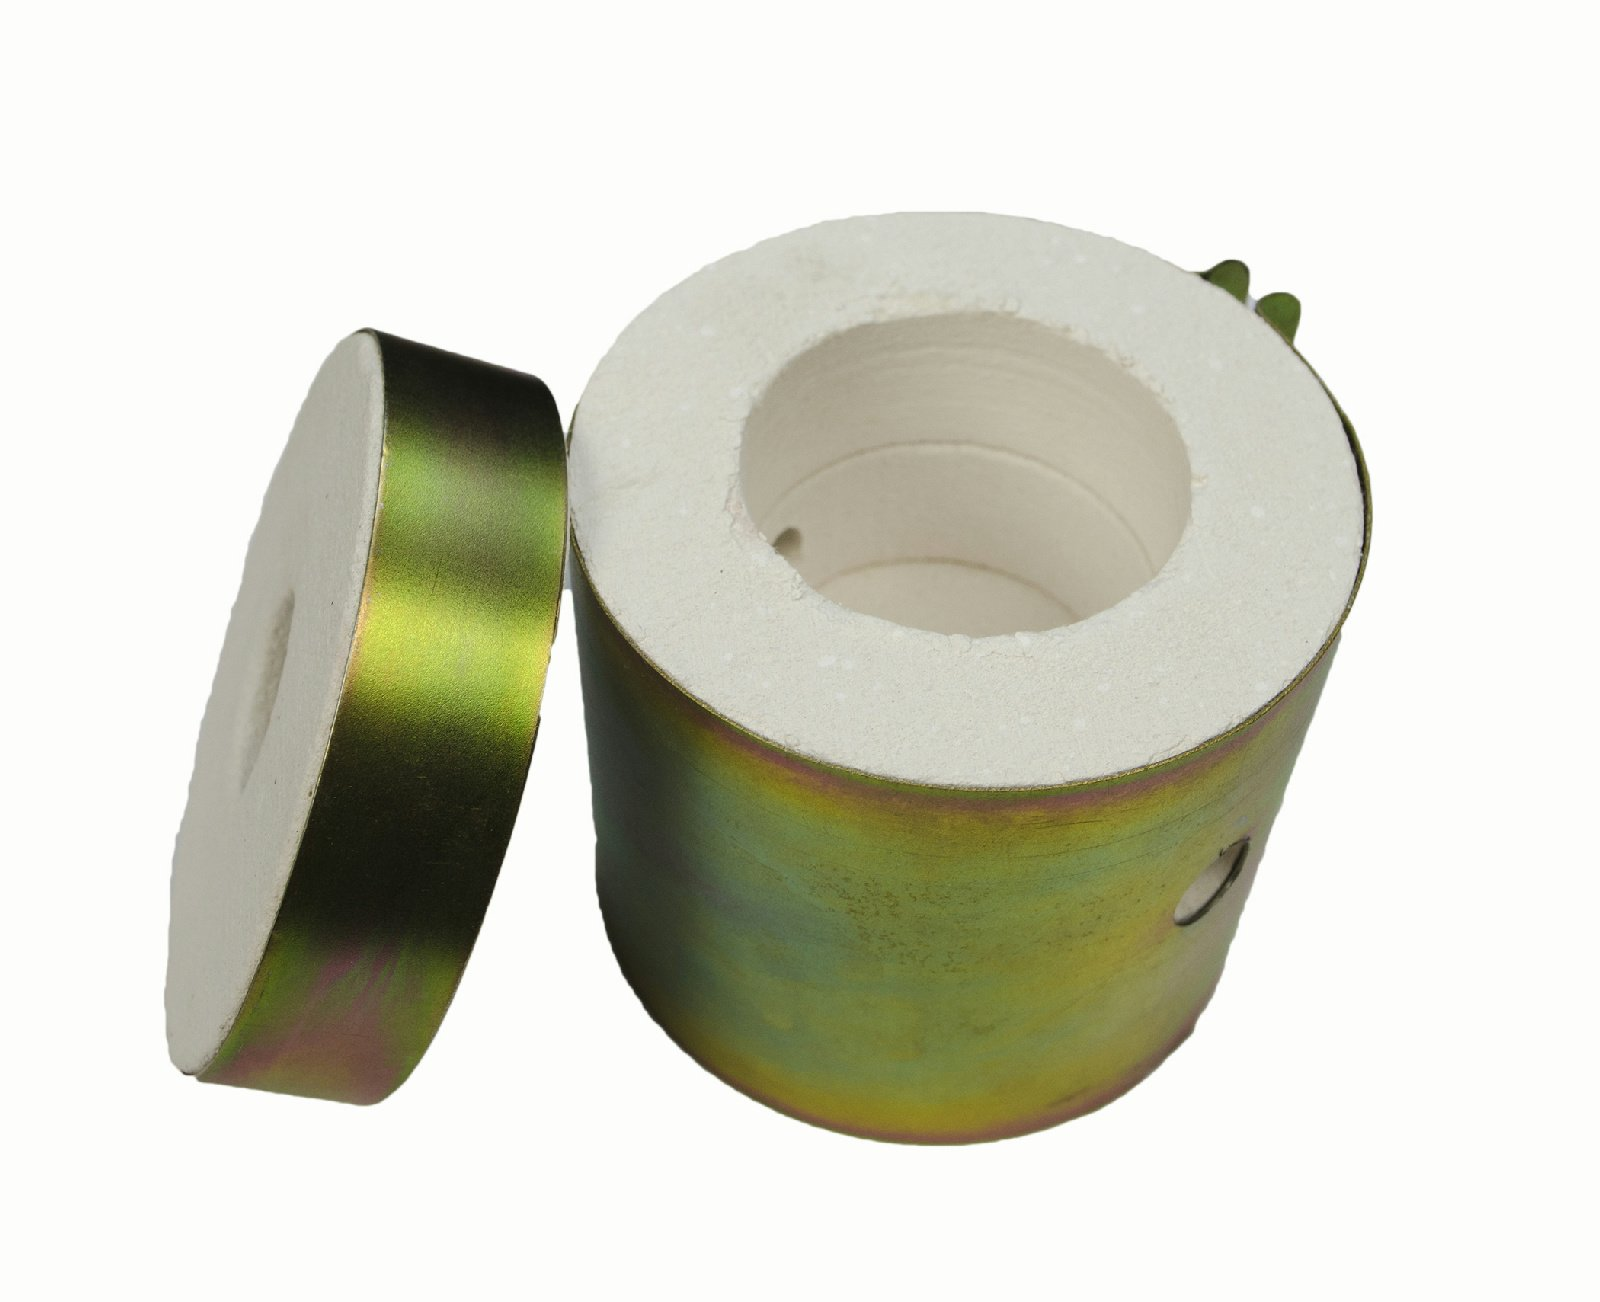 Fast Furnace Gold & Silver Melting Kiln - Mini Propane Gas - MADE in the USA